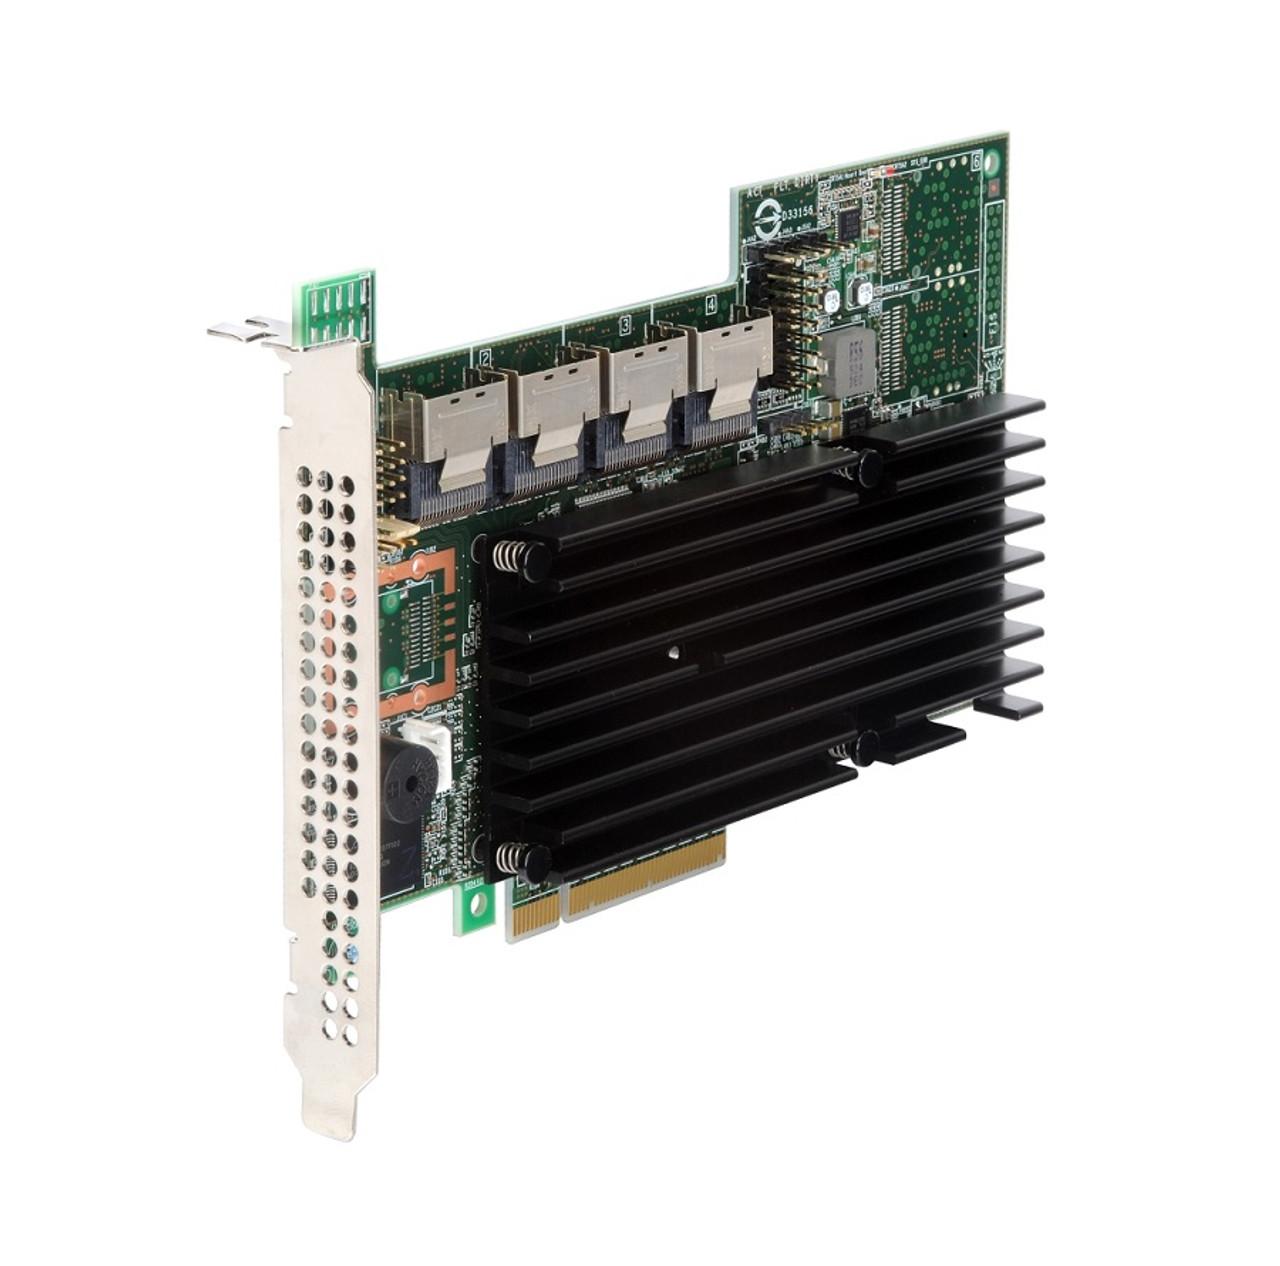 0YRPP6 - Dell Perc H730p 12GB PCI-Express 3 0 SAS Mini Blade Raid  Controller With 2GB Nv Flash Backed Cache